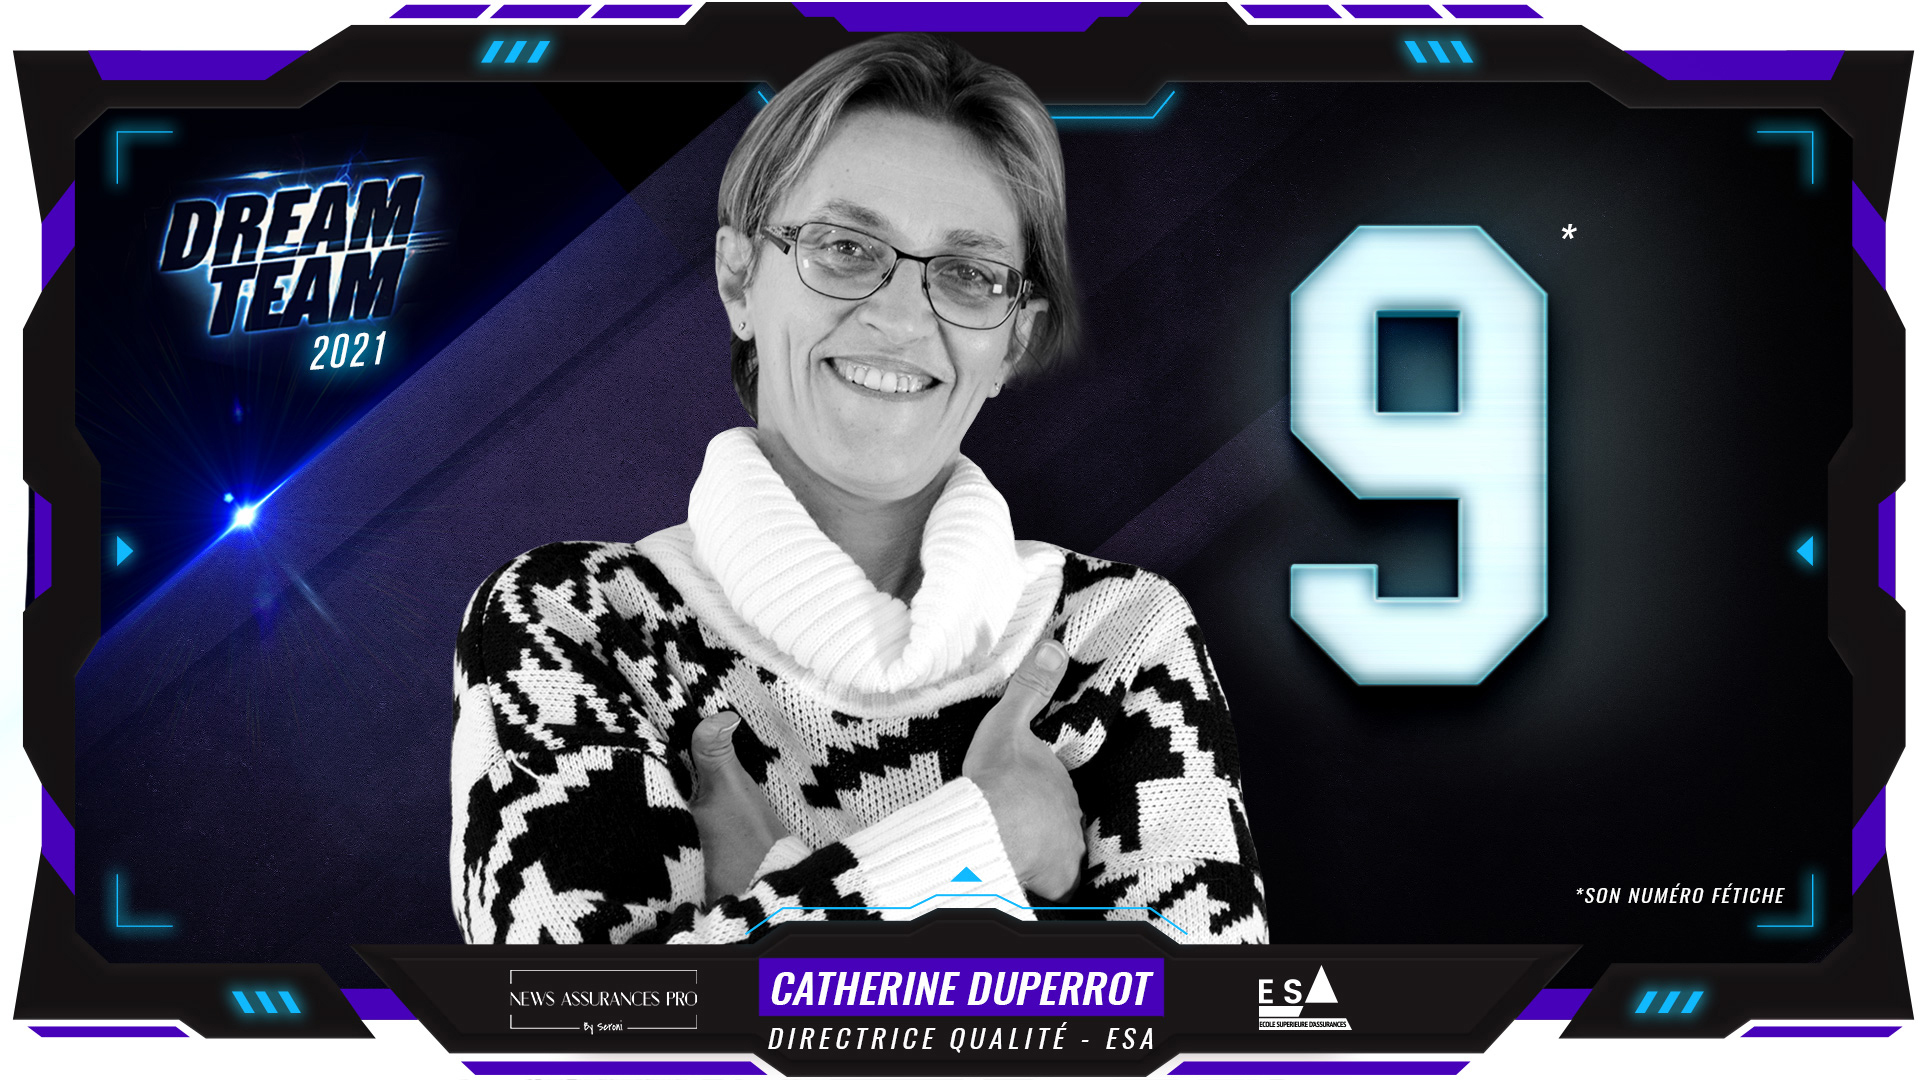 Catherine Duperrot